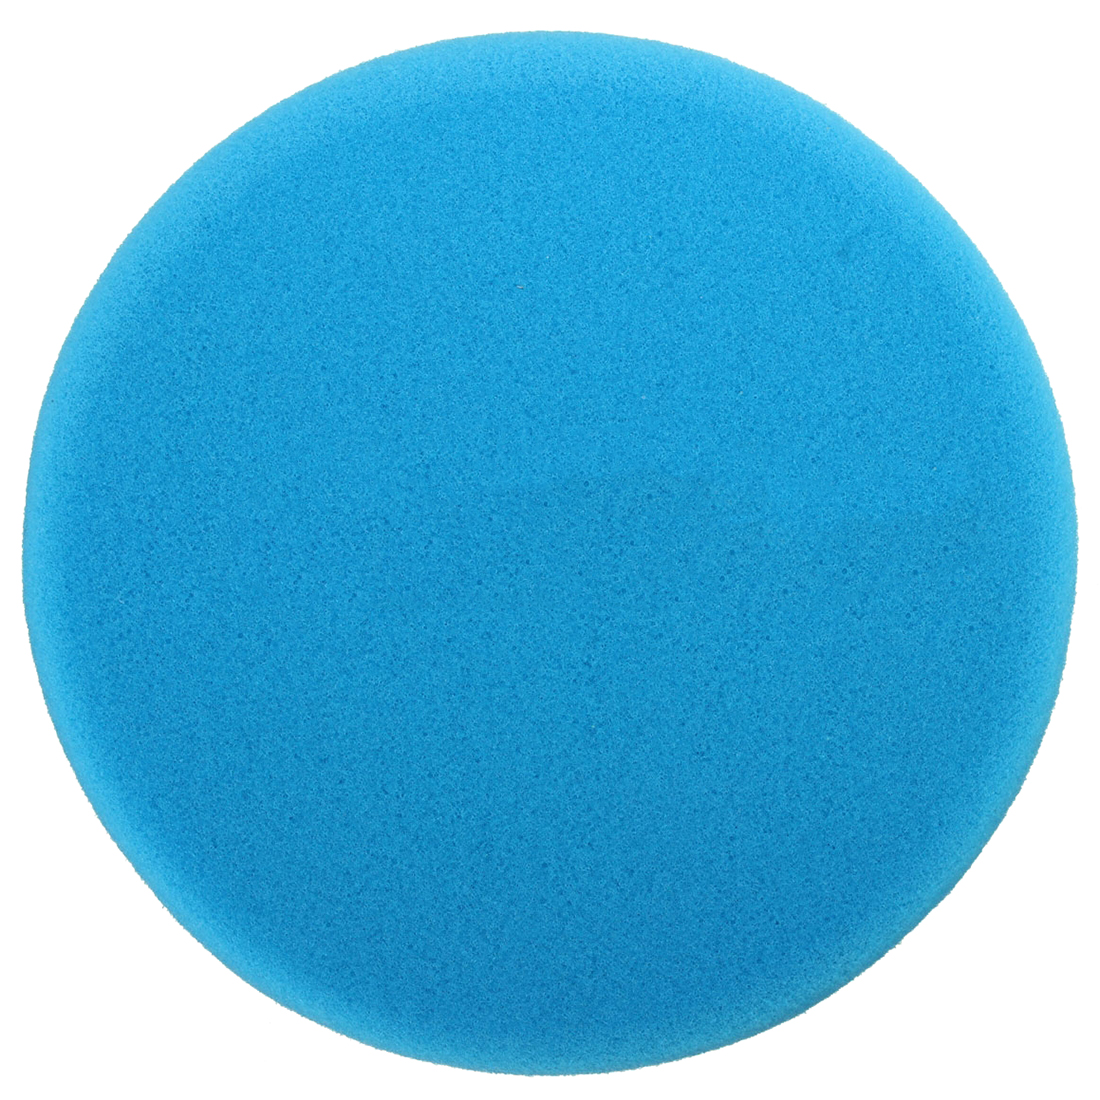 6 Inch 150mm Soft Flat Sponge Buffer Polishing Pad Kit For Auto Car Polisher Color:Blue